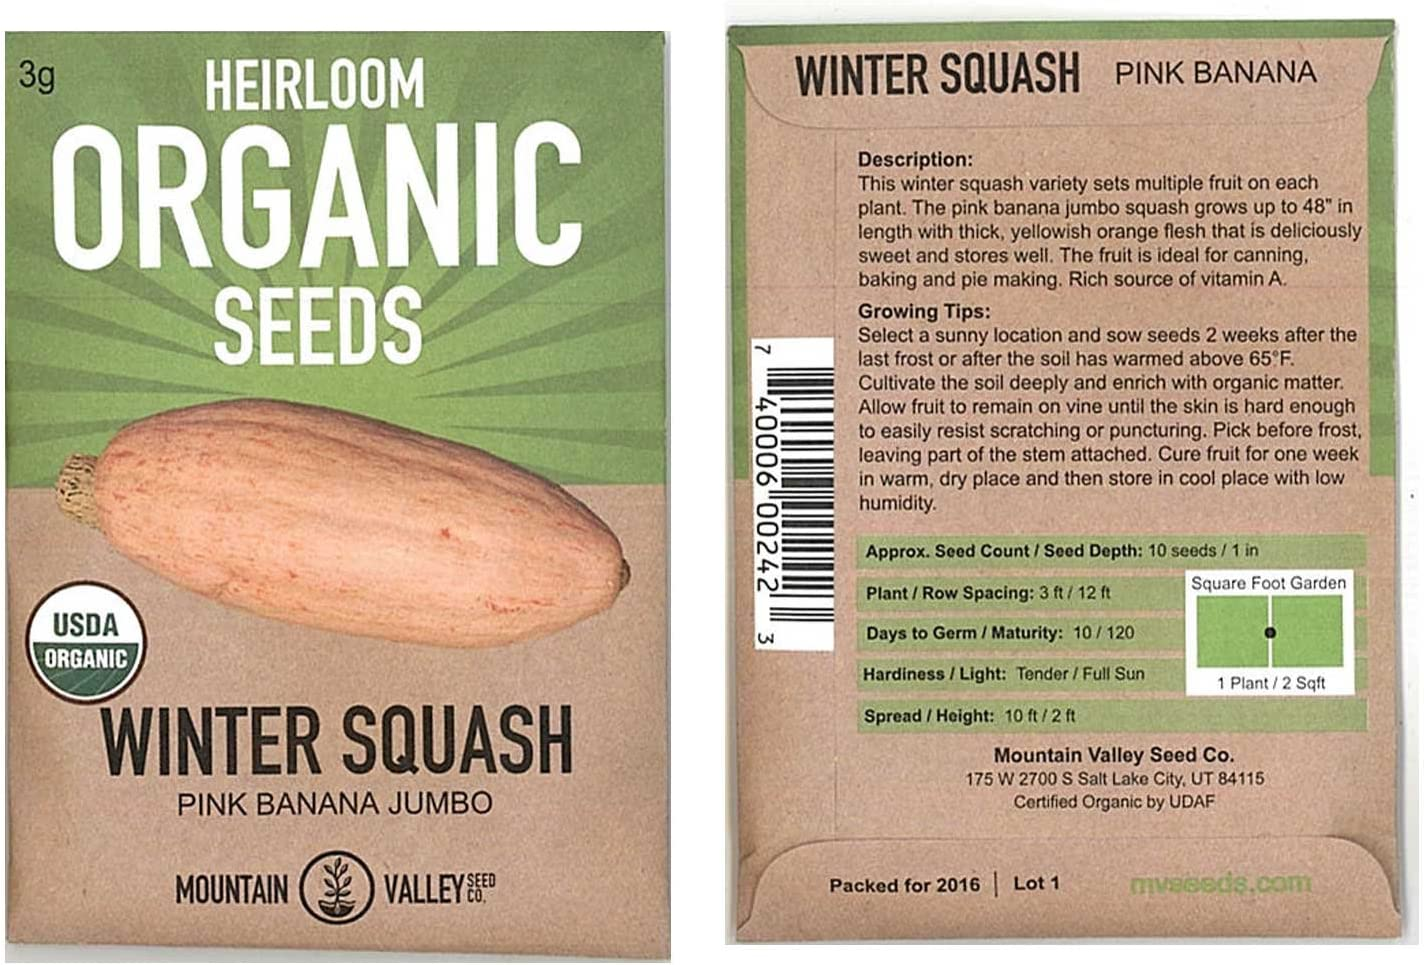 Pink Banana Jumbo Winter Squash Garden Seeds - 3 g Packet - Organic, Non-GMO, Heirloom - Vegetable Gardening Seed